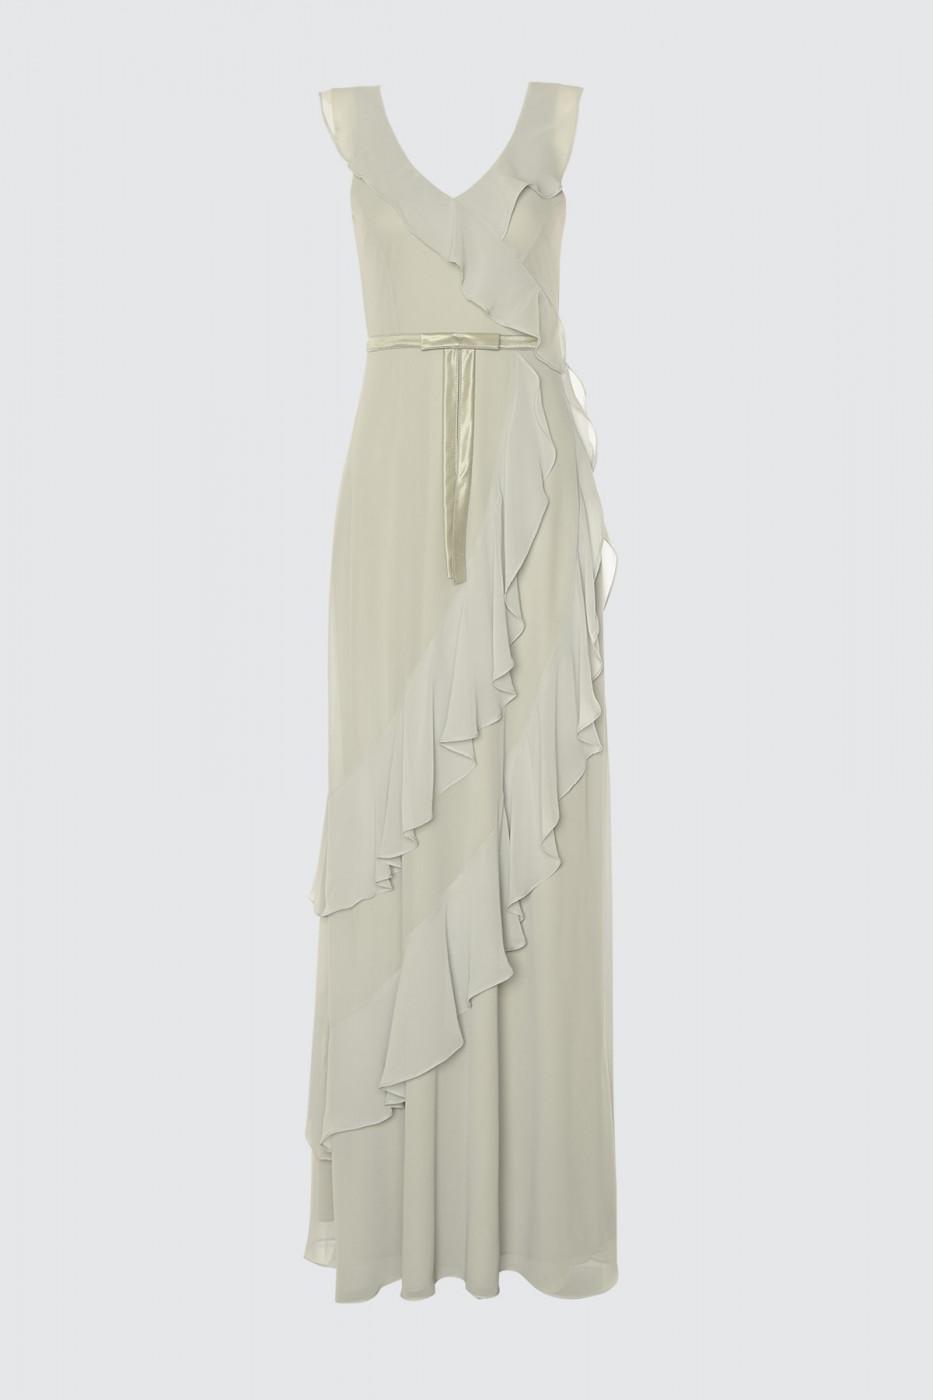 Trendyol Grey Frill Detailed Evening Dress & Graduation Dress